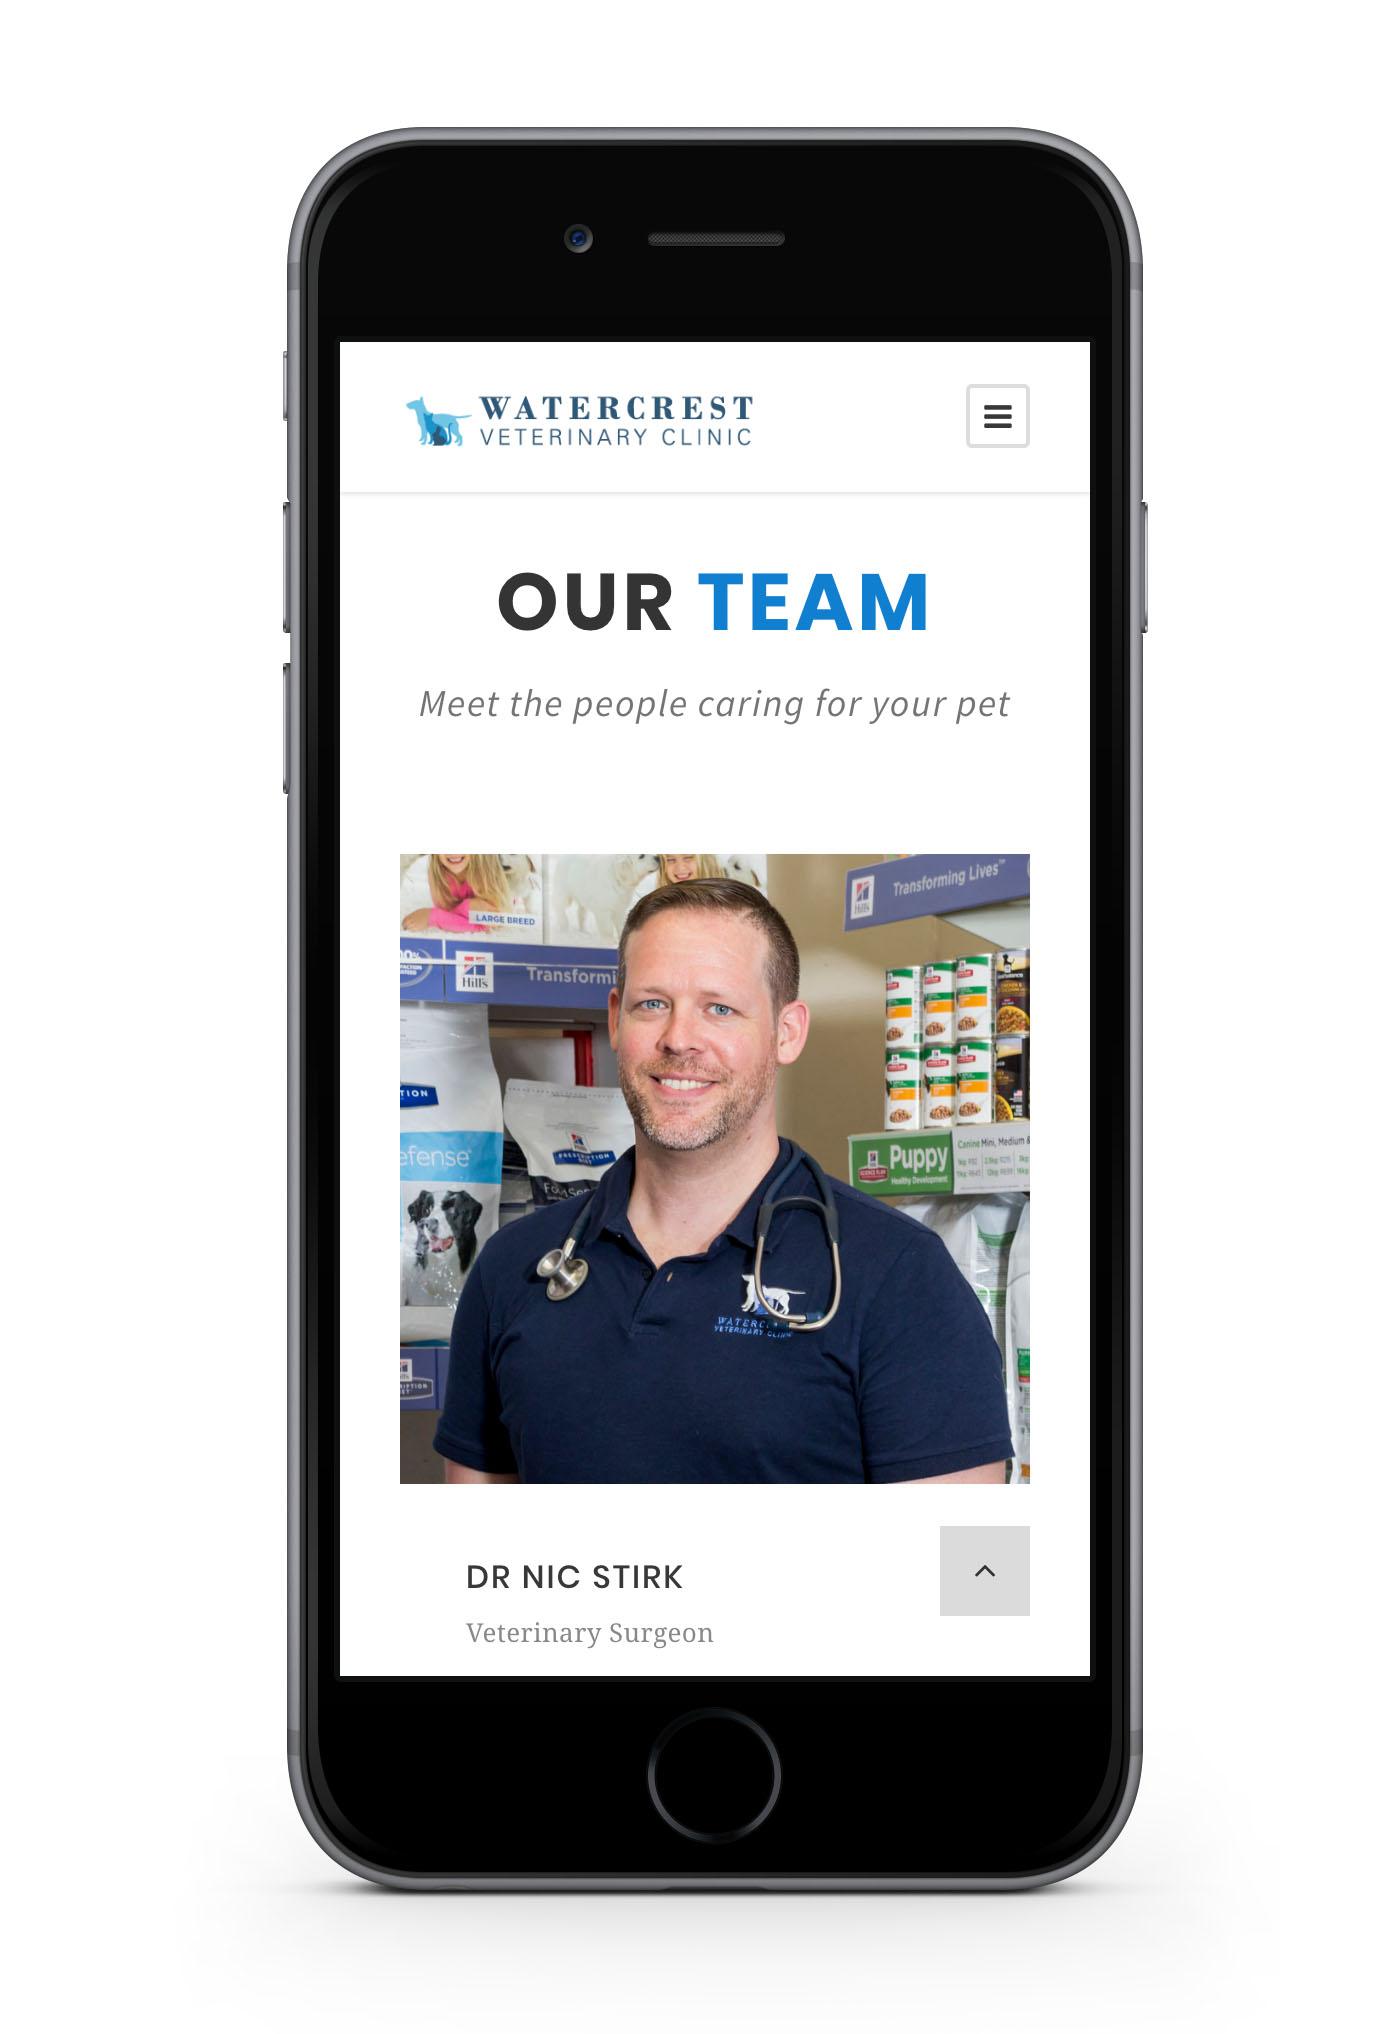 watercrest vet web-design-portfolio-webdoor-responsive-web-design-agency-hillcrest-kwazulu-natal-phone